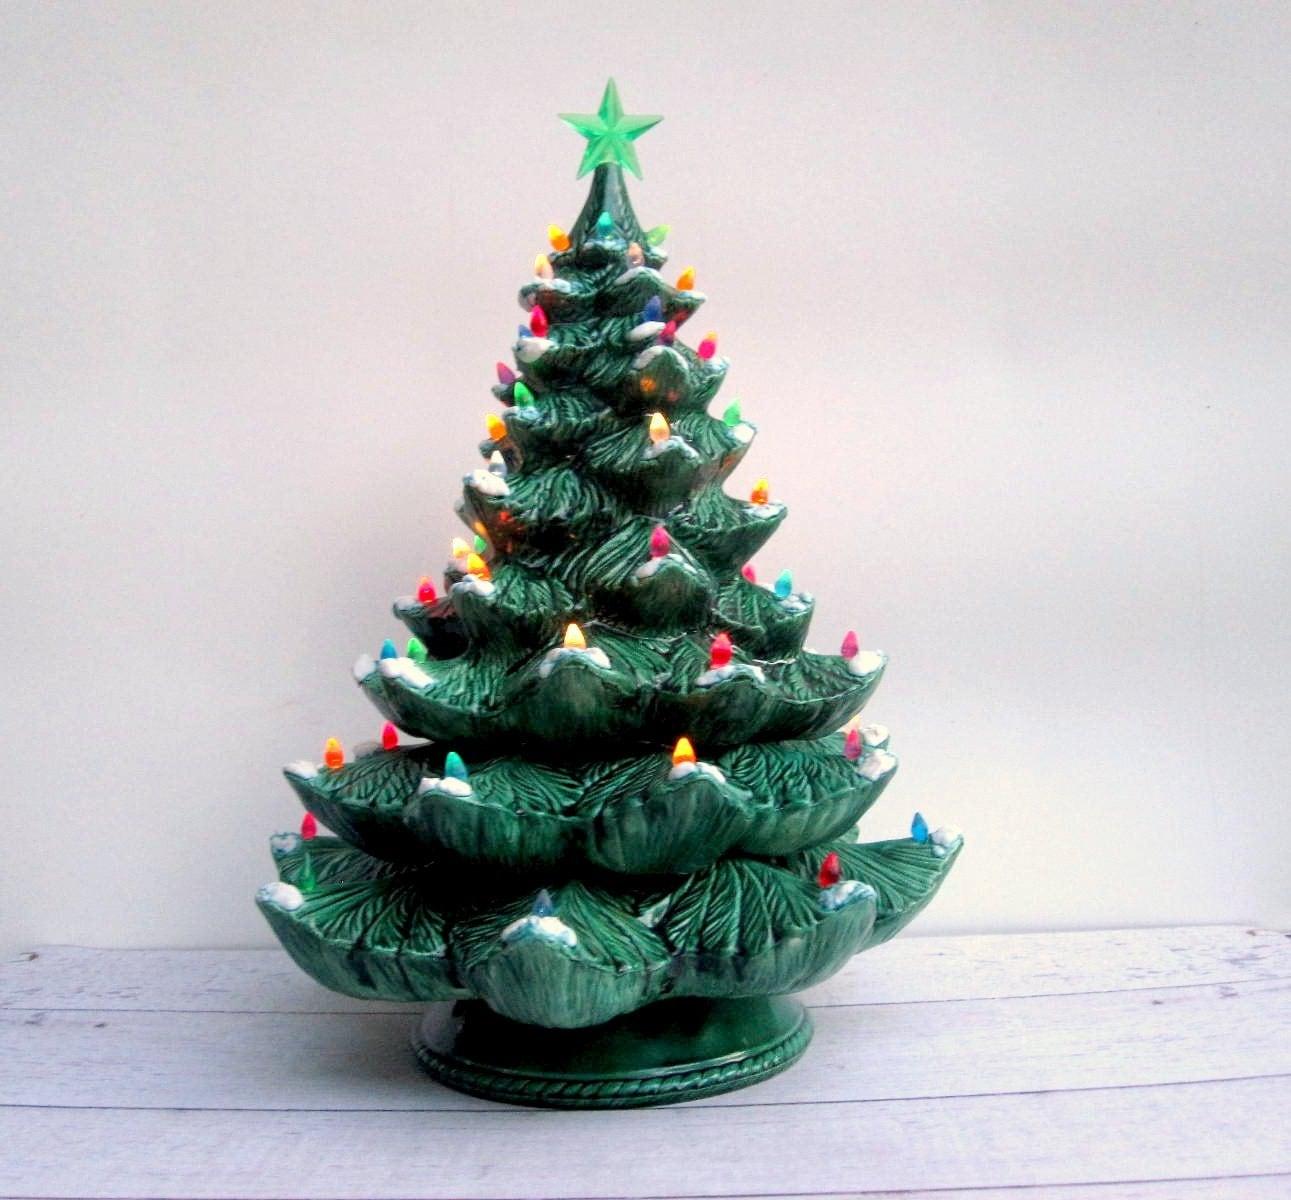 Big Christmas Tree Lights: Lighted Ceramic Christmas Tree Giant Size With Lamp Base